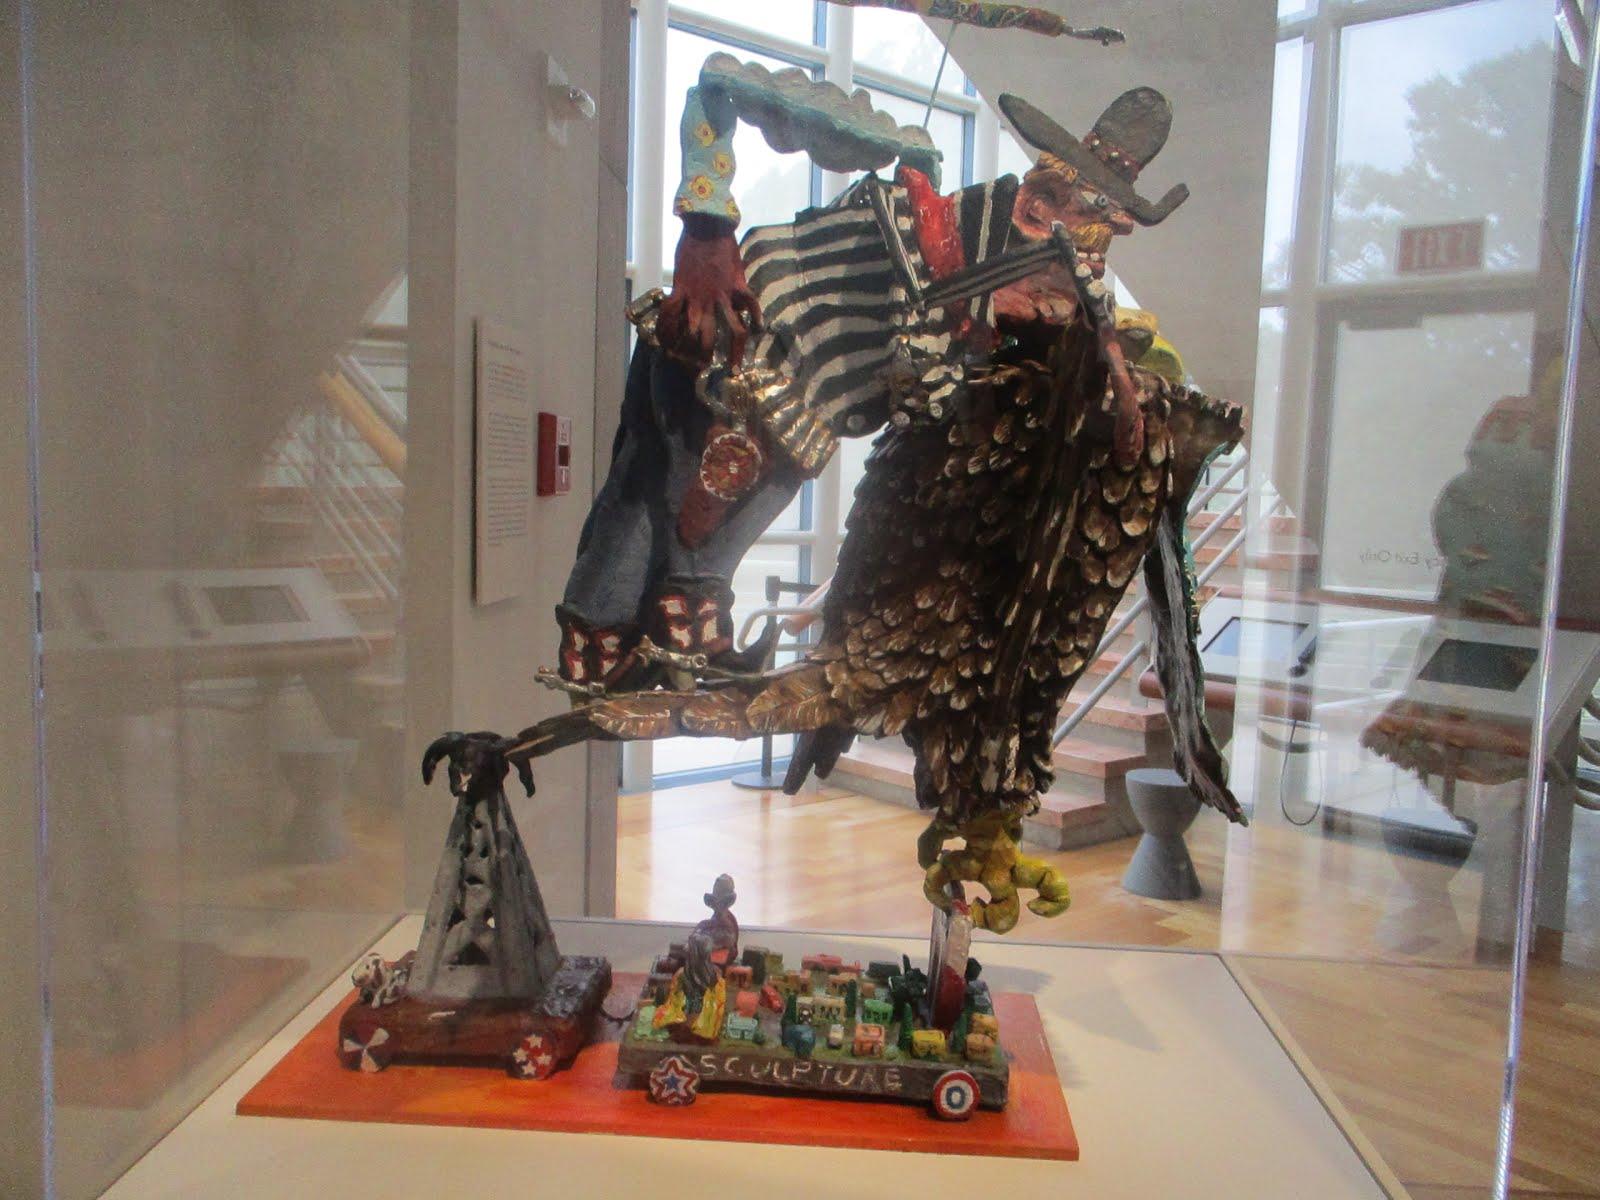 RICHMOND VIRGINIA MUSEUM OF ART